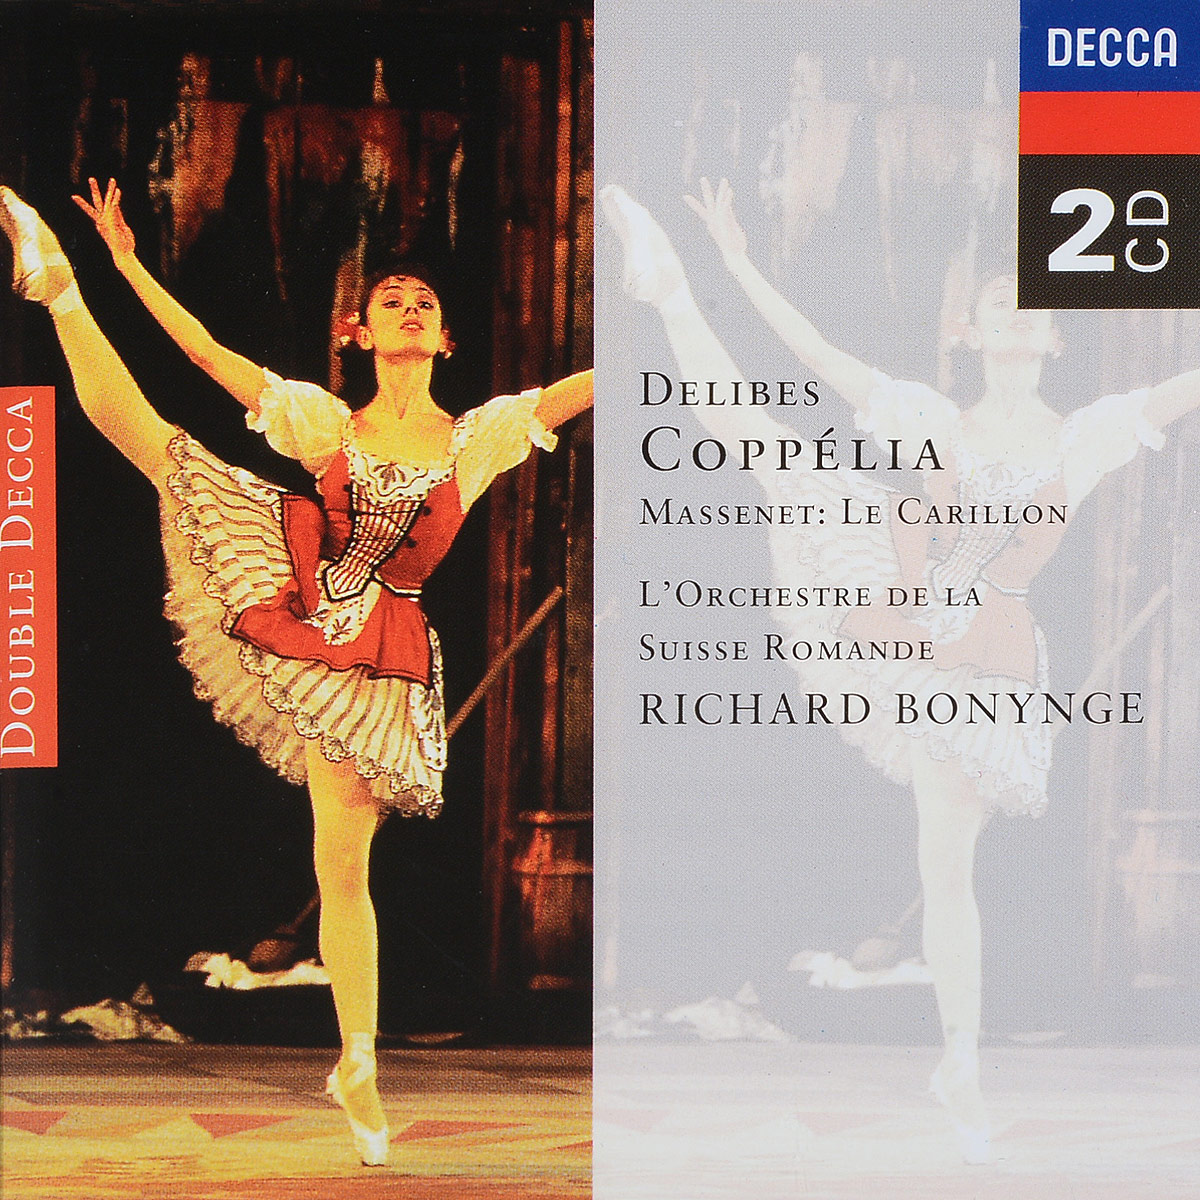 Delibes / Massenet. L'Orchestre De La Suisse Romande, Richard Bonynge. Coppelia / Le Carillon (2 CD) massenet cendrillon 2 dvd